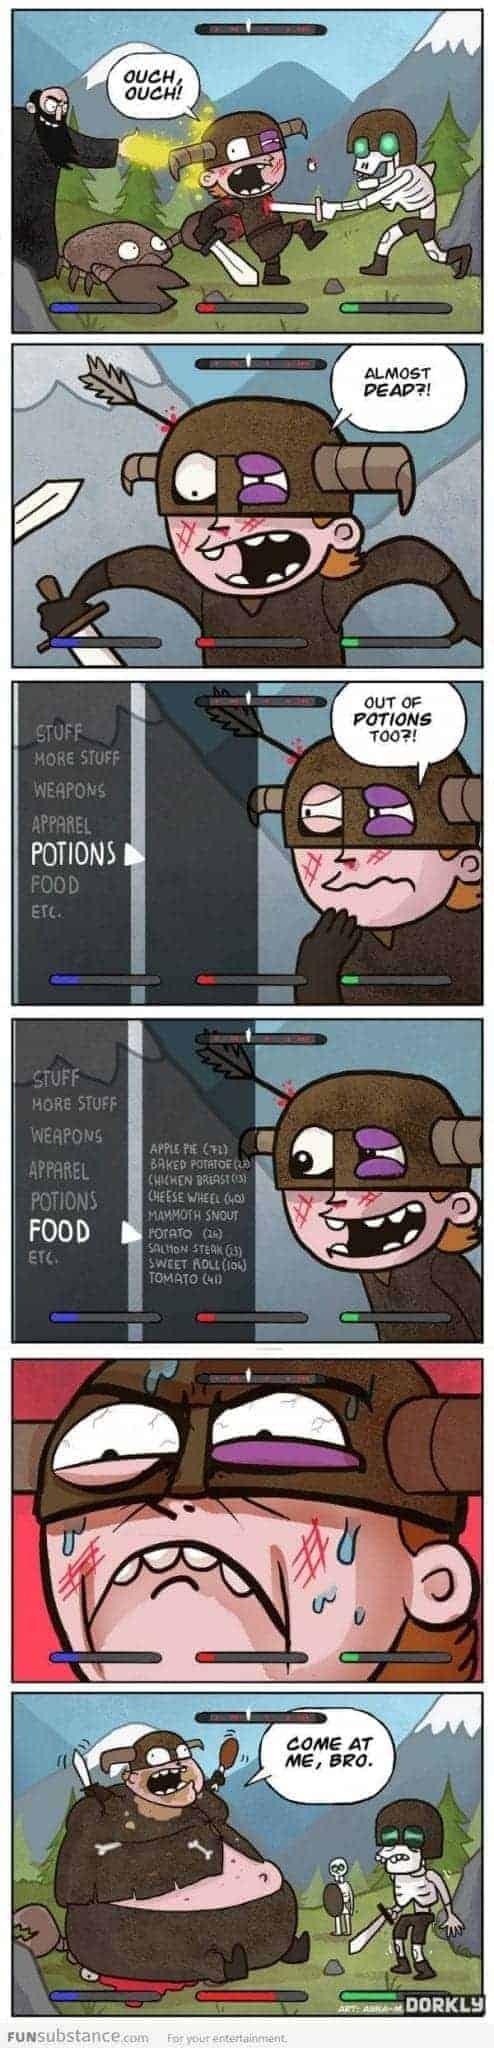 Video game Logic: Skyrim, Last Resort. Image Source:, Artist: Anna-Maria Jung